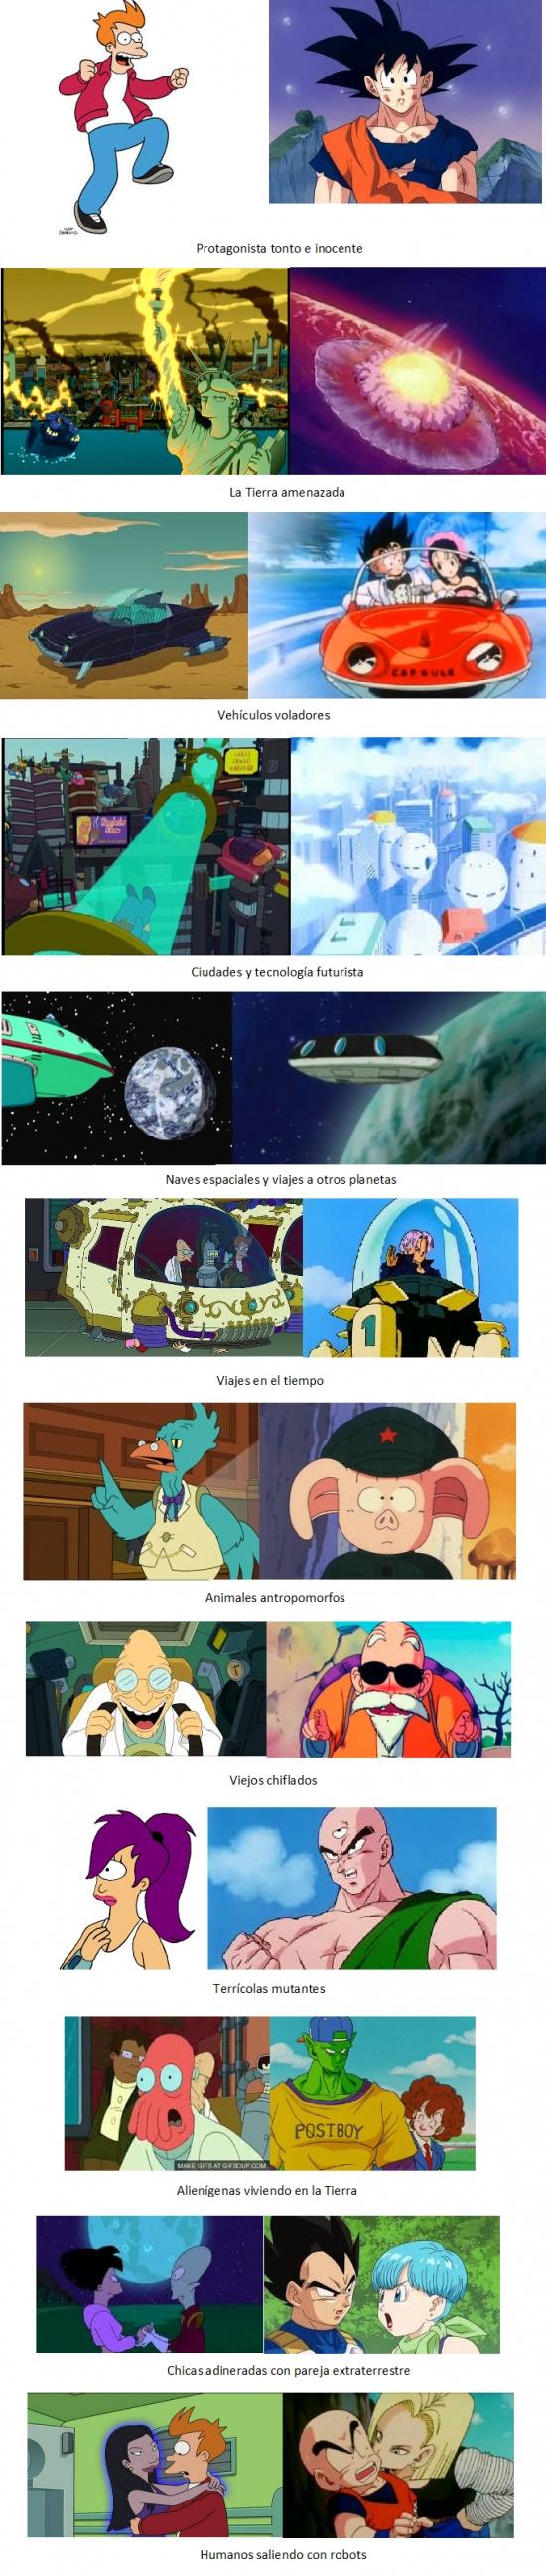 Otros - Similitudes entre Futurama y Dragon Ball